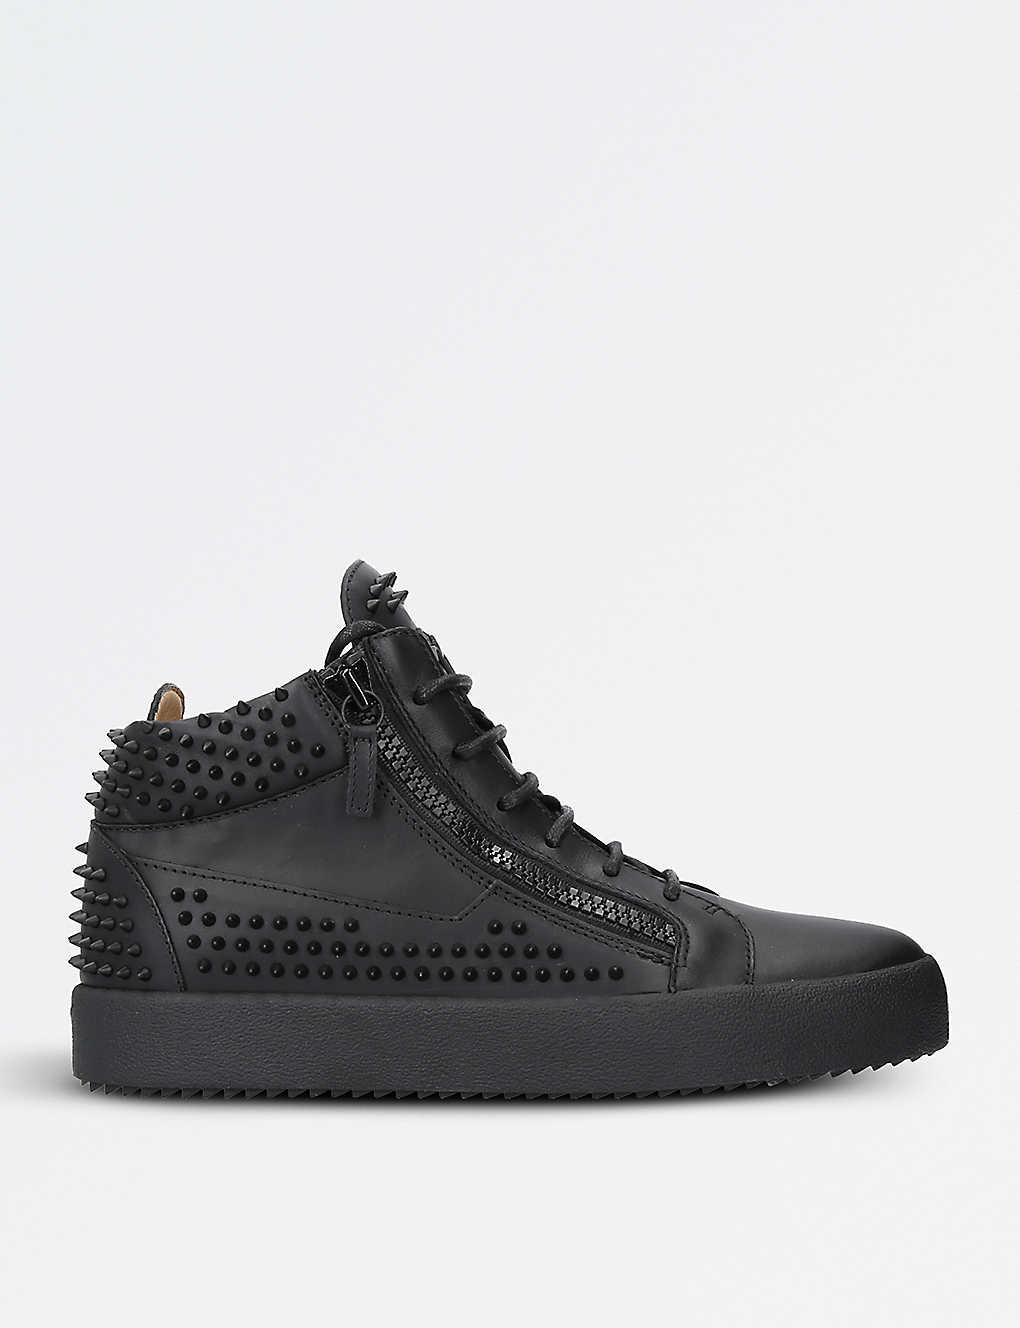 5b5d3f404d83d GIUSEPPE ZANOTTI - Spike leather trainers | Selfridges.com